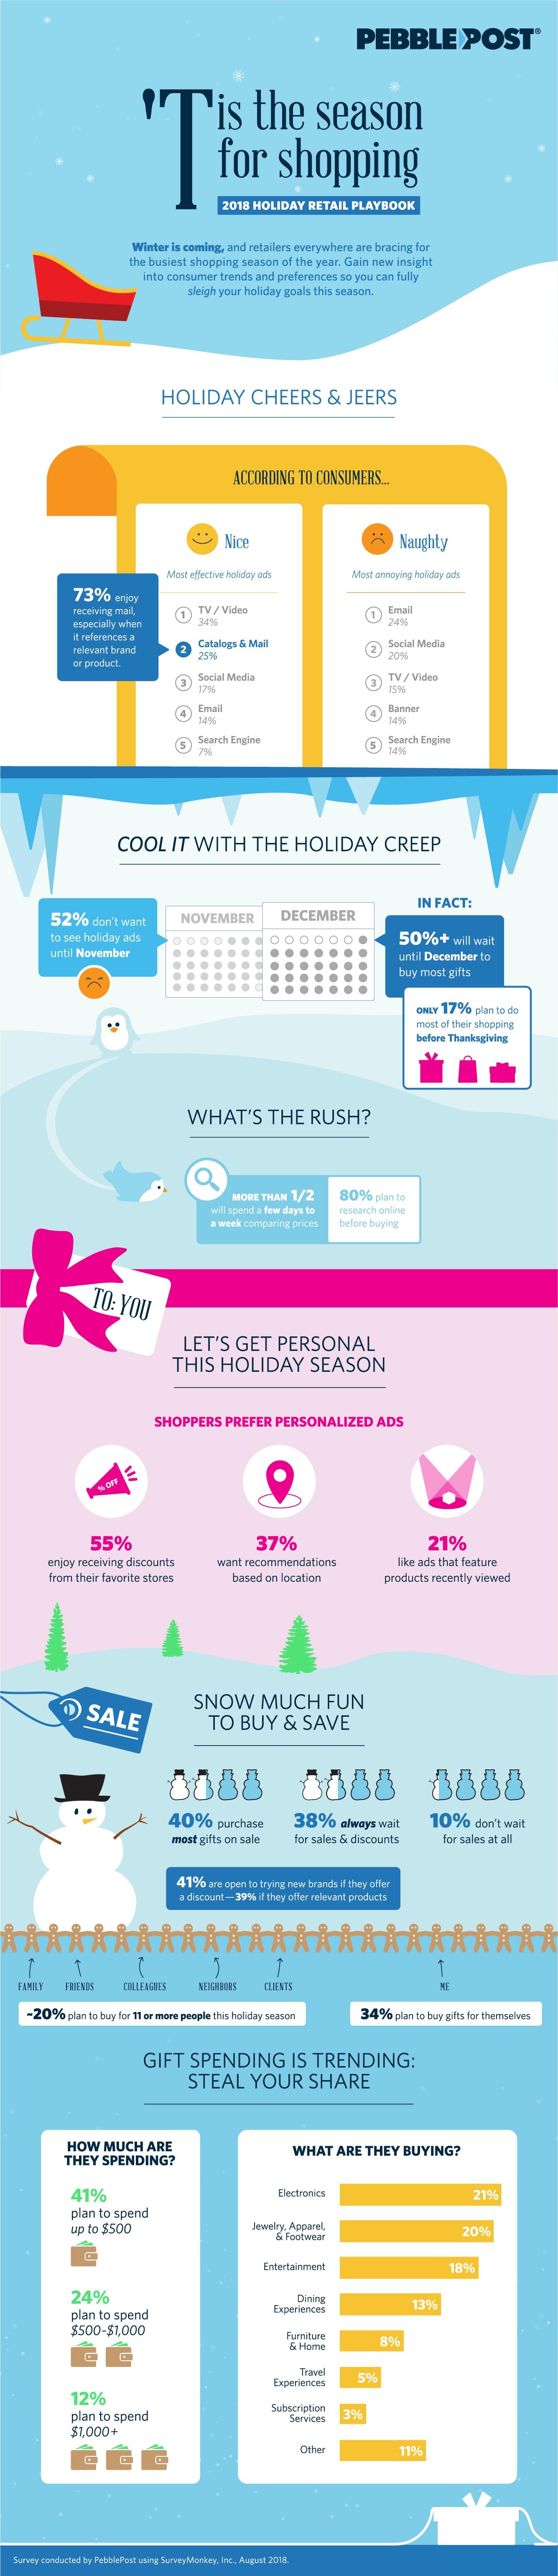 PebblePost Holiday 2018 Infographic